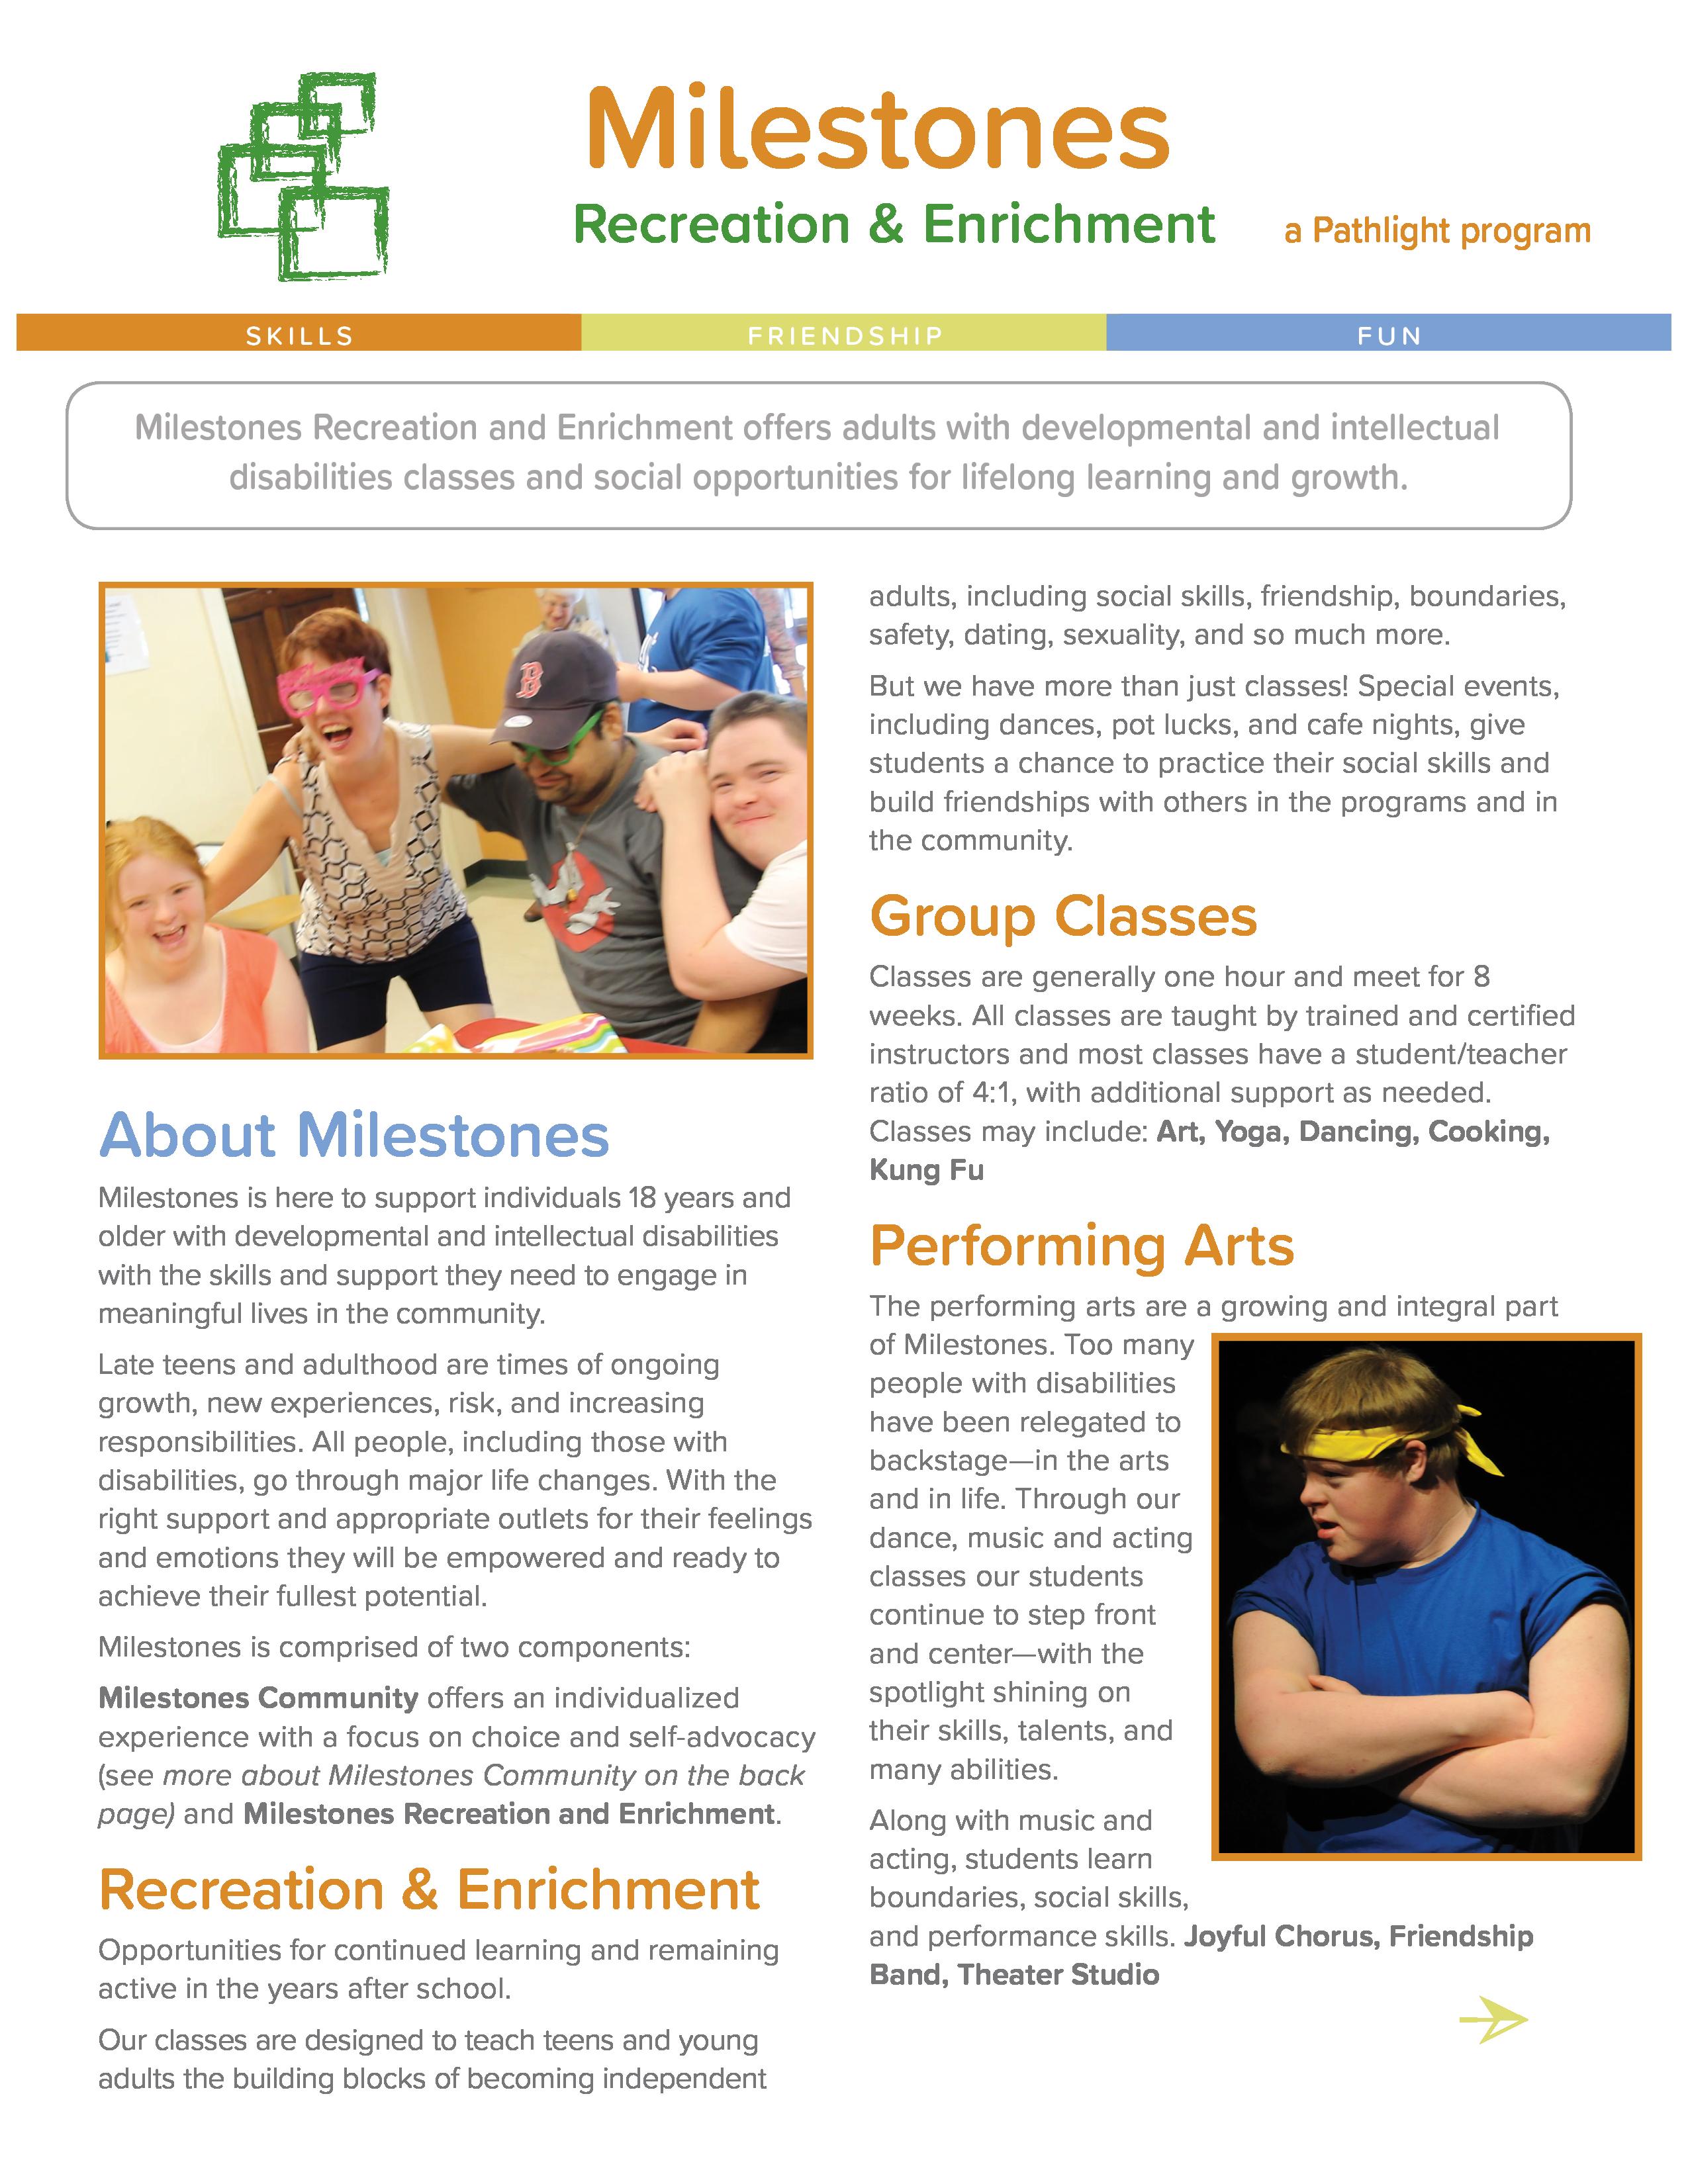 Milestones Rec & Enrichment flat thumbnail